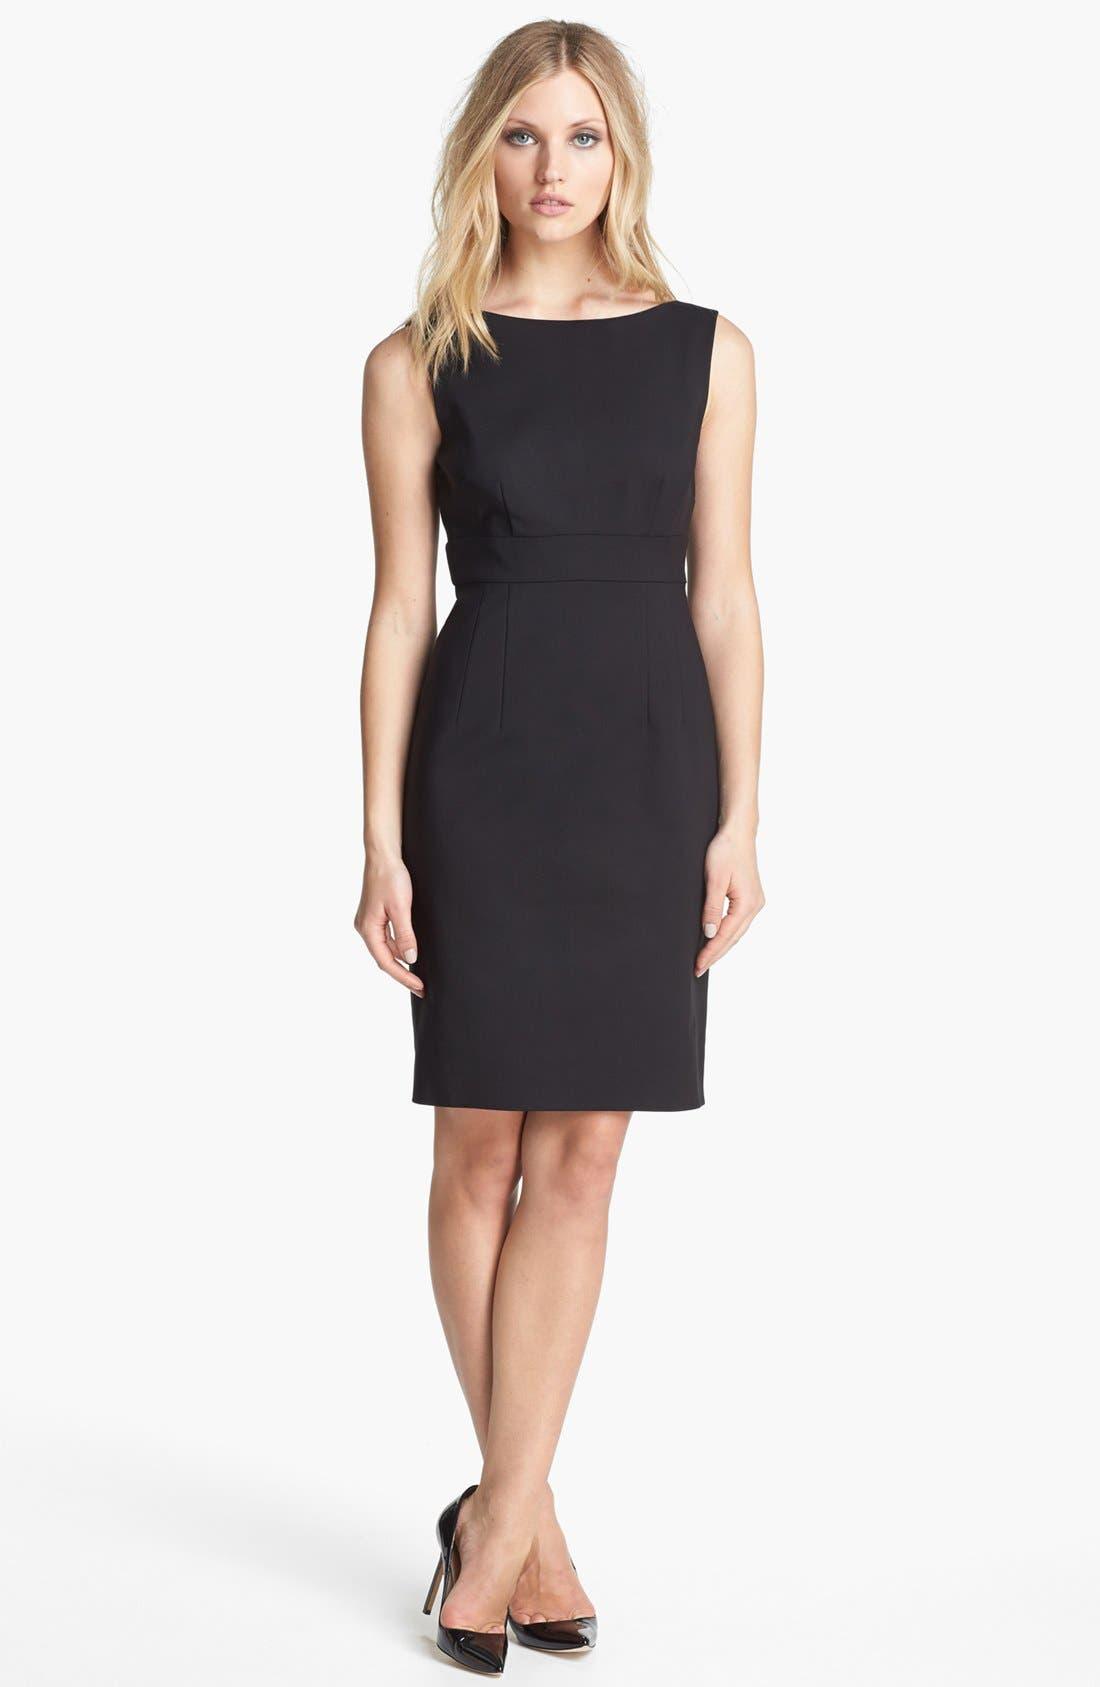 KATE SPADE NEW YORK 'joyann' sleeveless dress, Main, color, 001